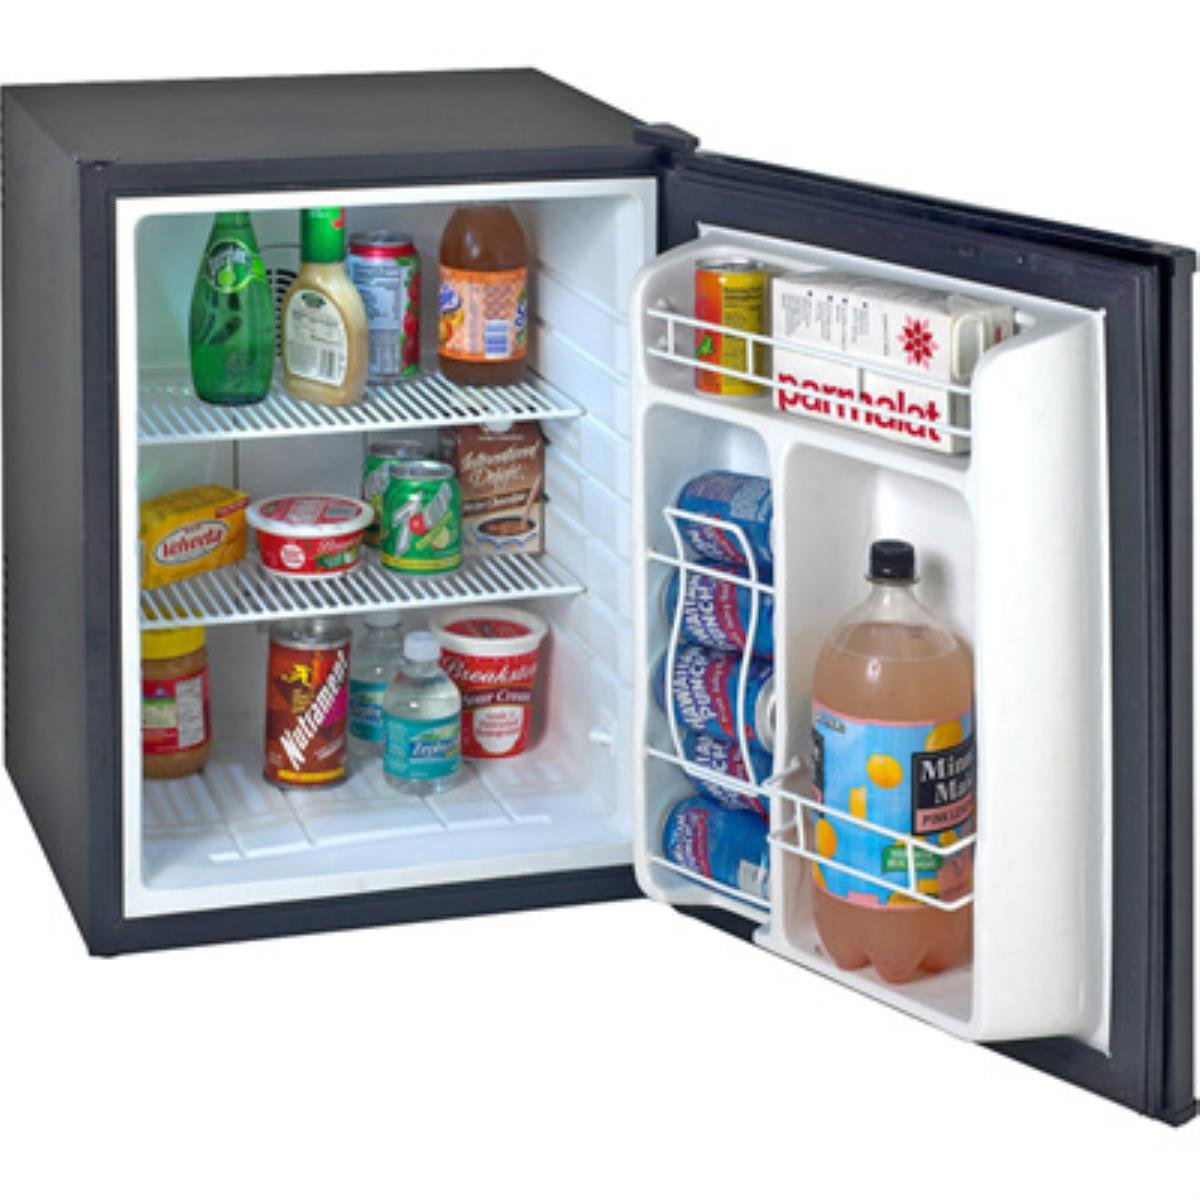 Avanti Mini Refrigerator Parts Wiring Diagram Cubic Feet Superconductor Super Quiet Black Compact Refrigerators Kitchen Dining 1200x1200